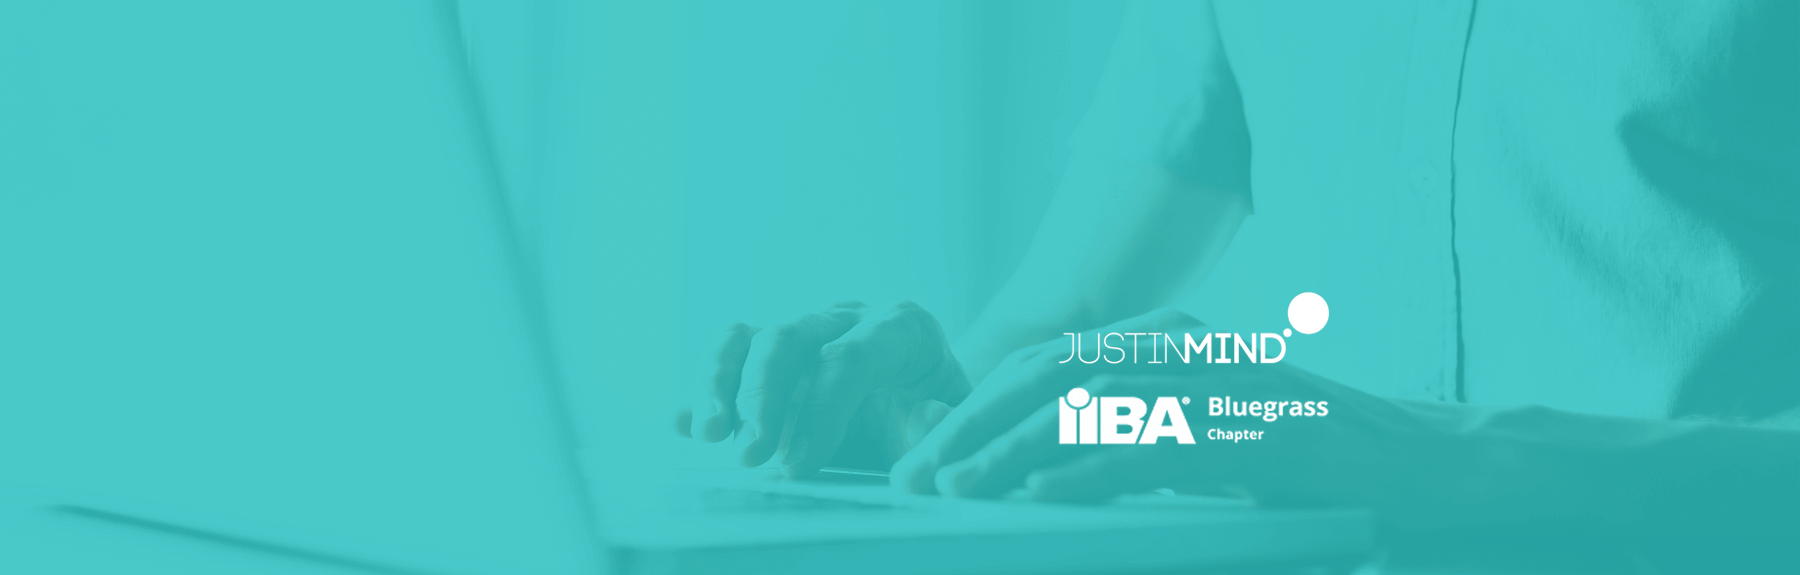 iiba-justinmind-requirements-visualization-webinar-header